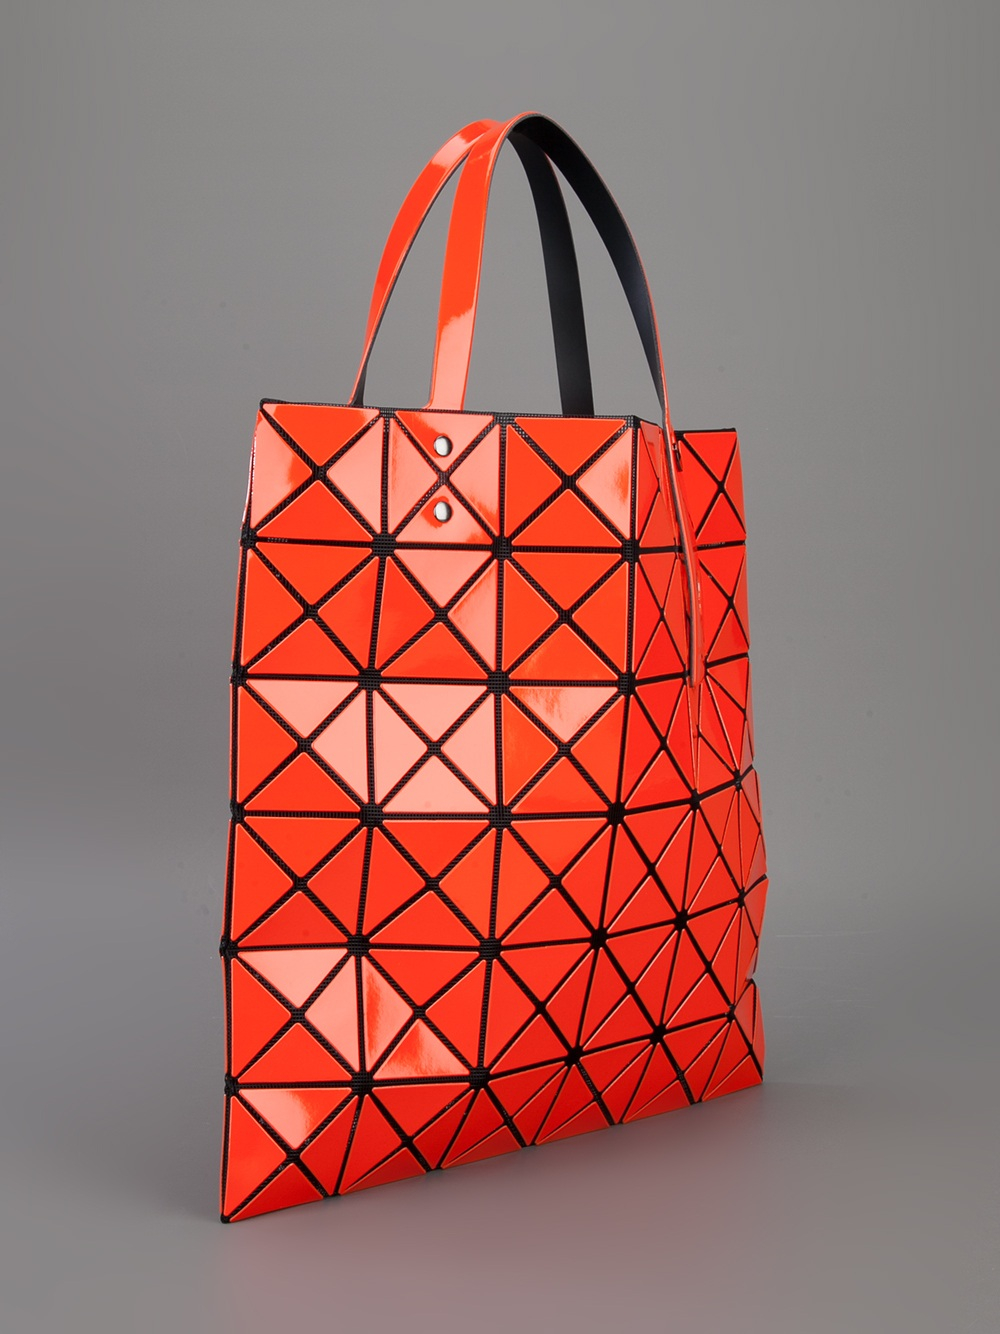 6f7067563b7d ... Messenger Bag  half off 1a14f ccf3e Lyst - Bao Bao Issey Miyake  Geometric Mesh Detail Tote in Or ...